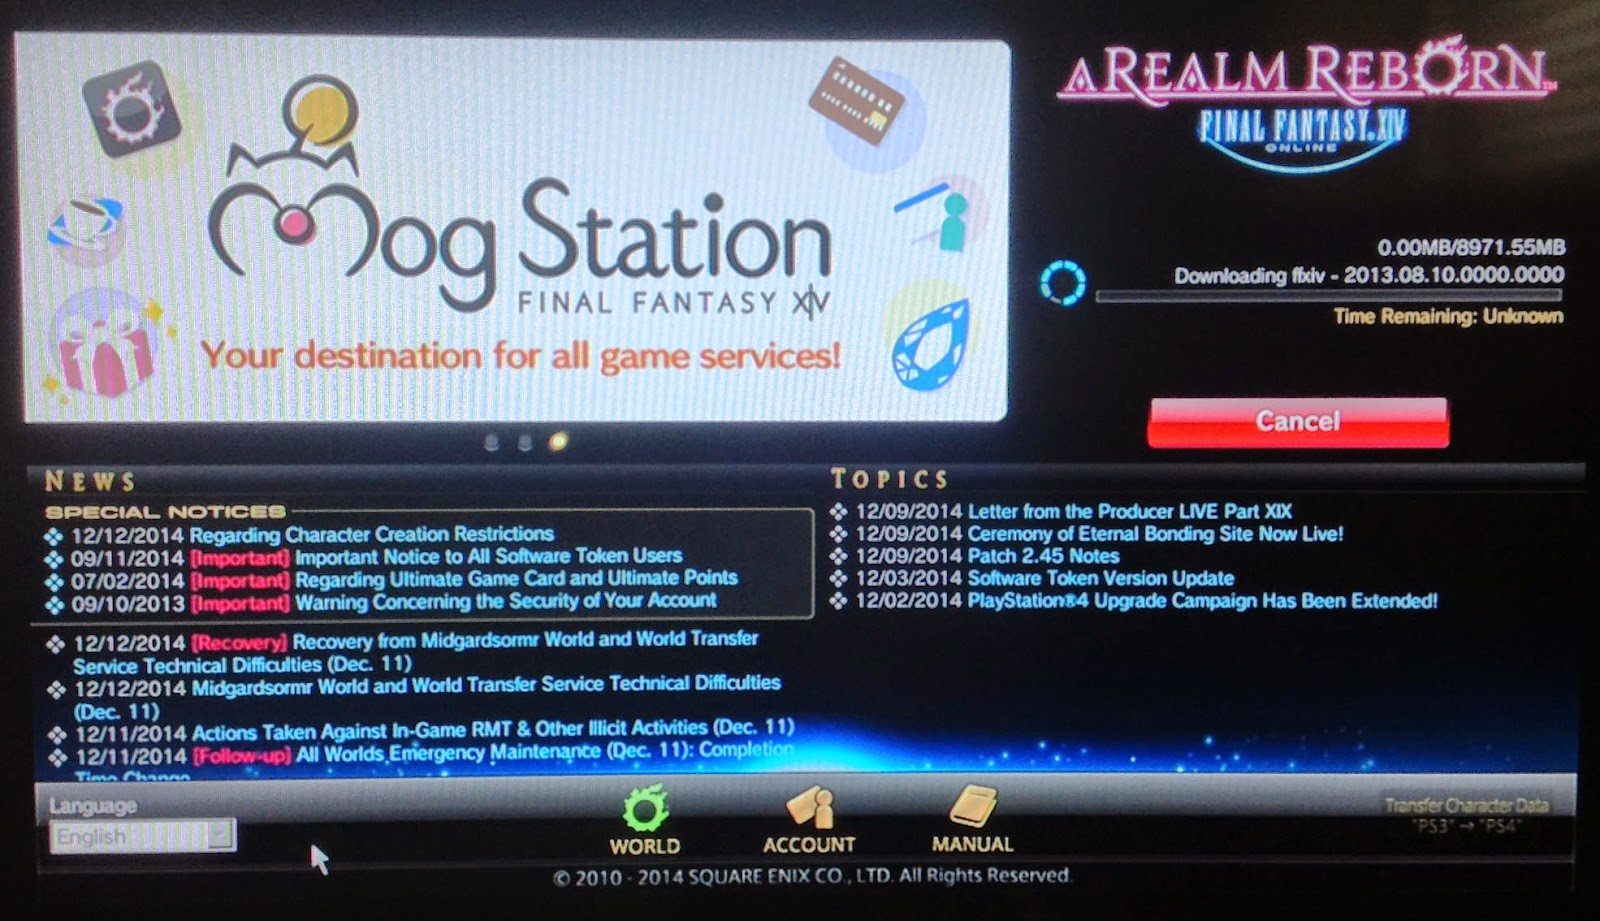 PSN World Deals: GUIDE: Registration tutorial for Final Fantasy XIV